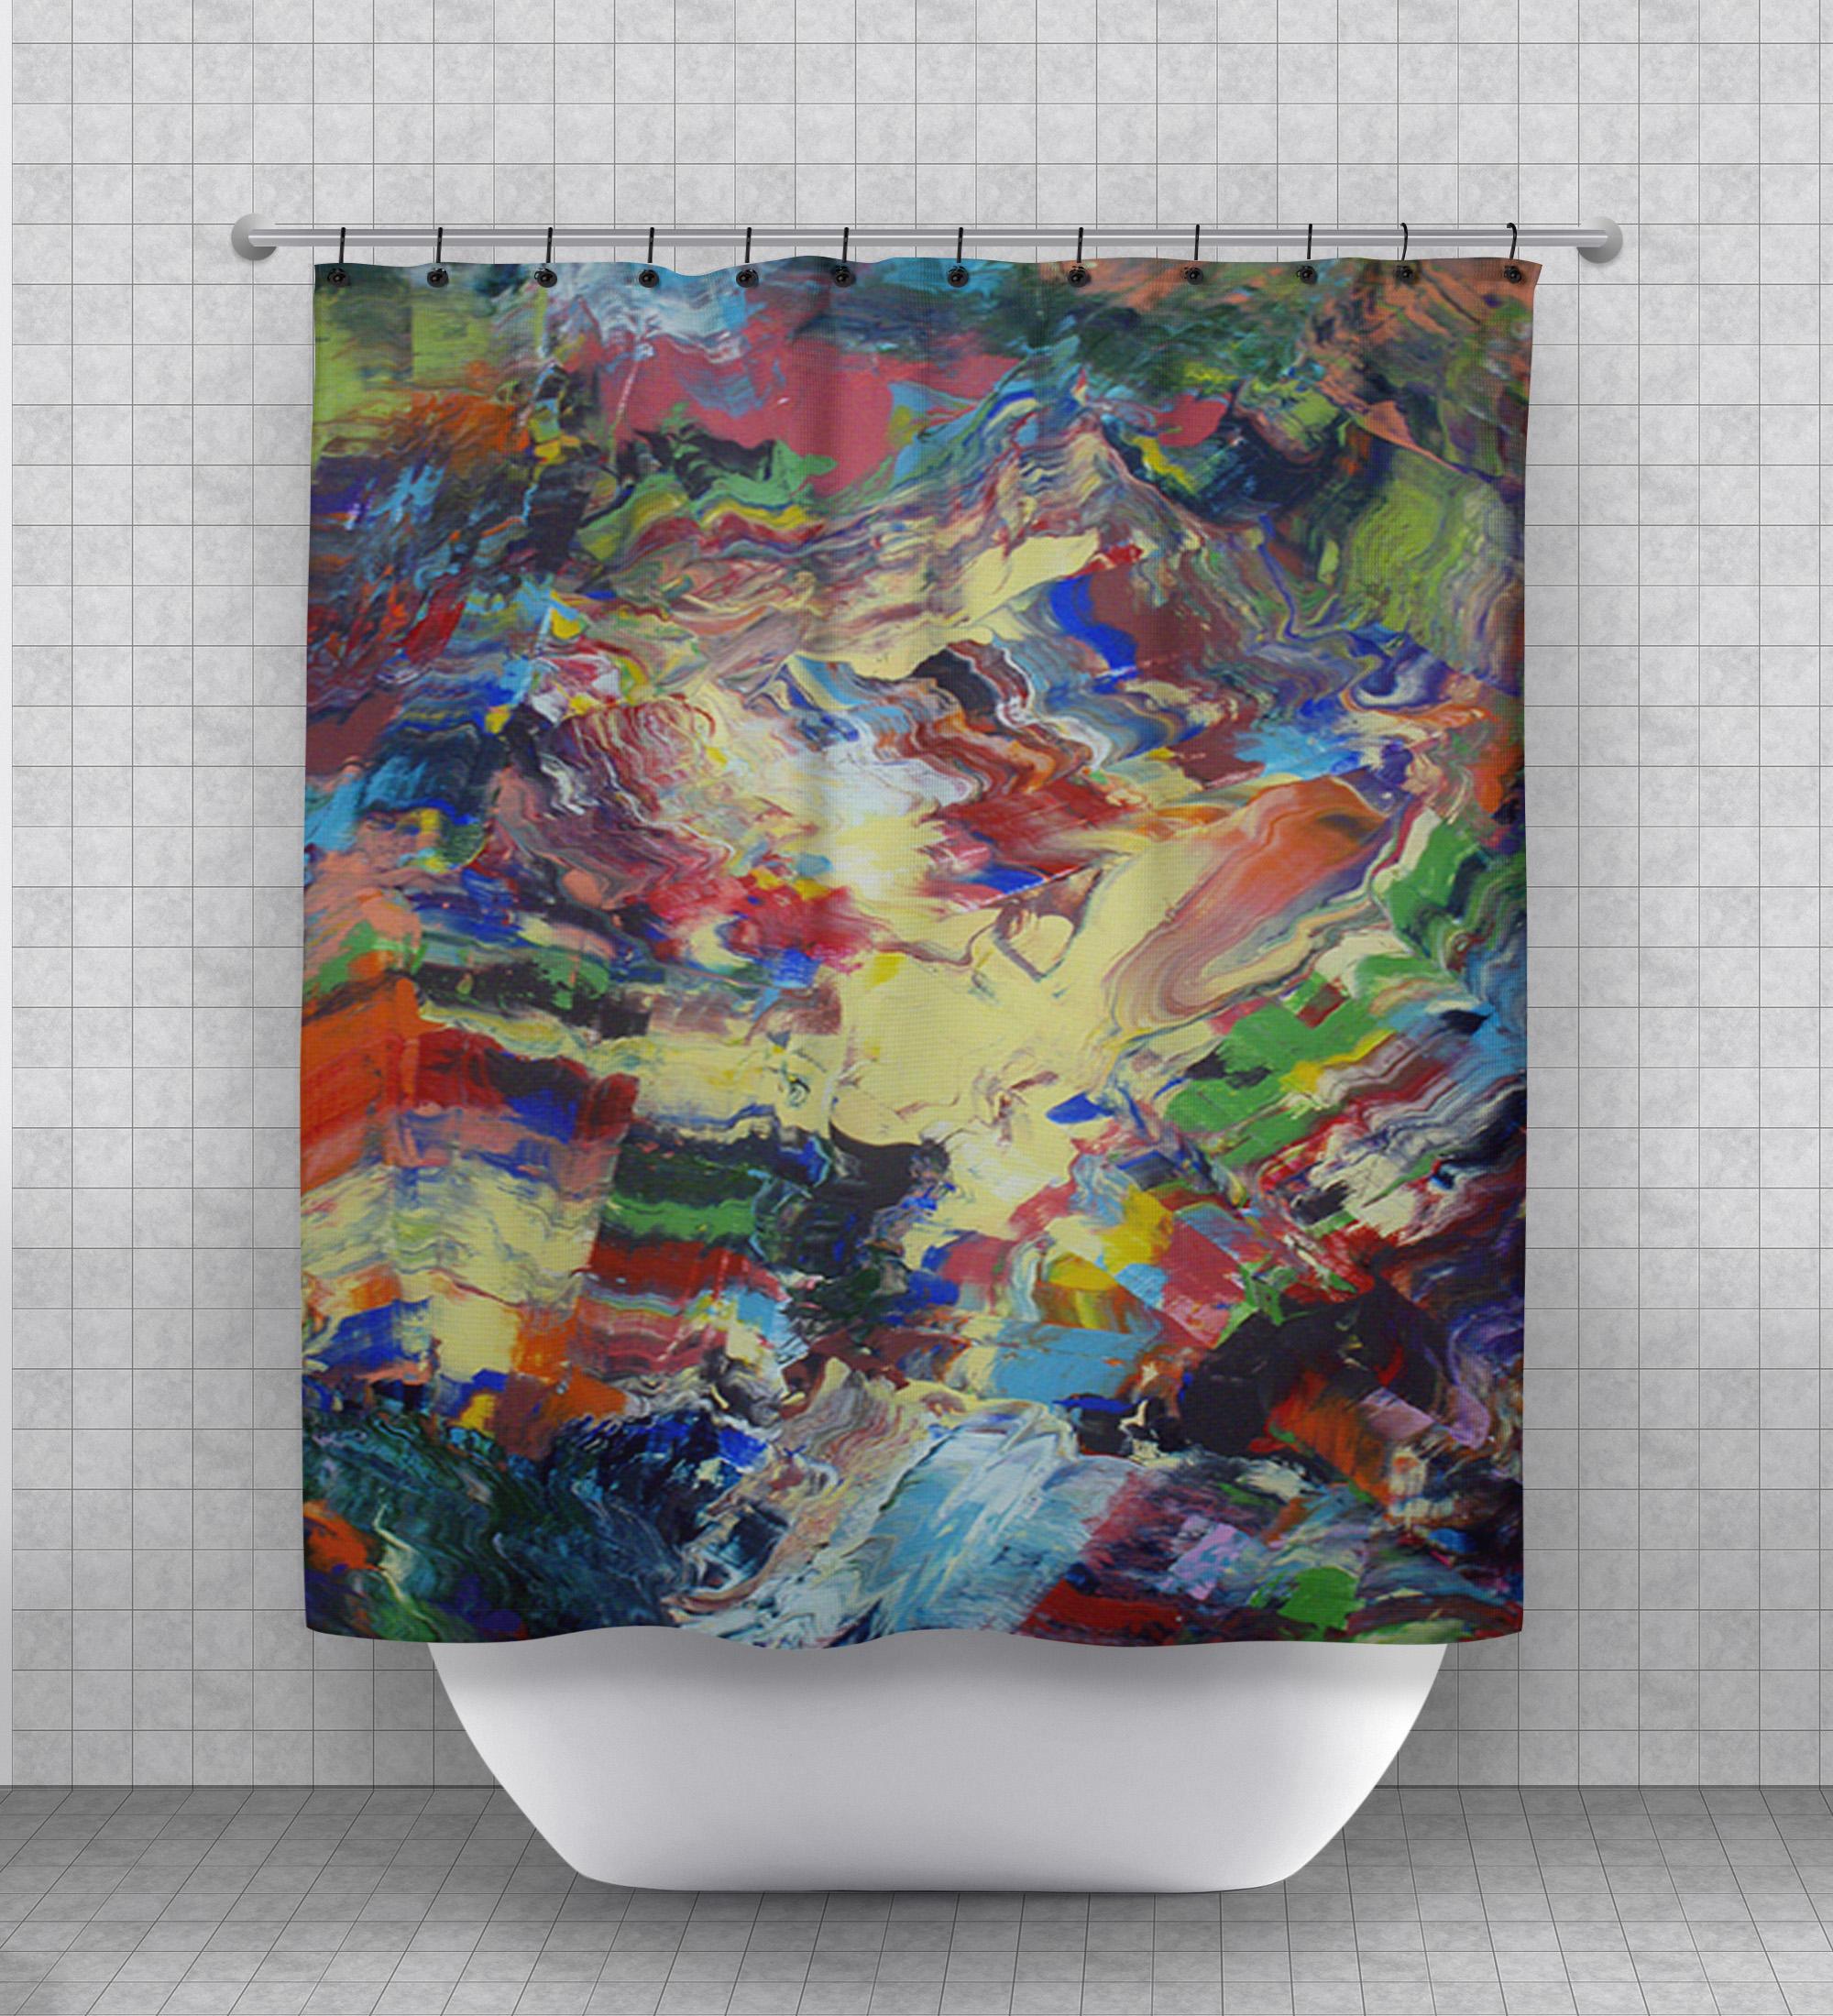 168 marvel shower curtain